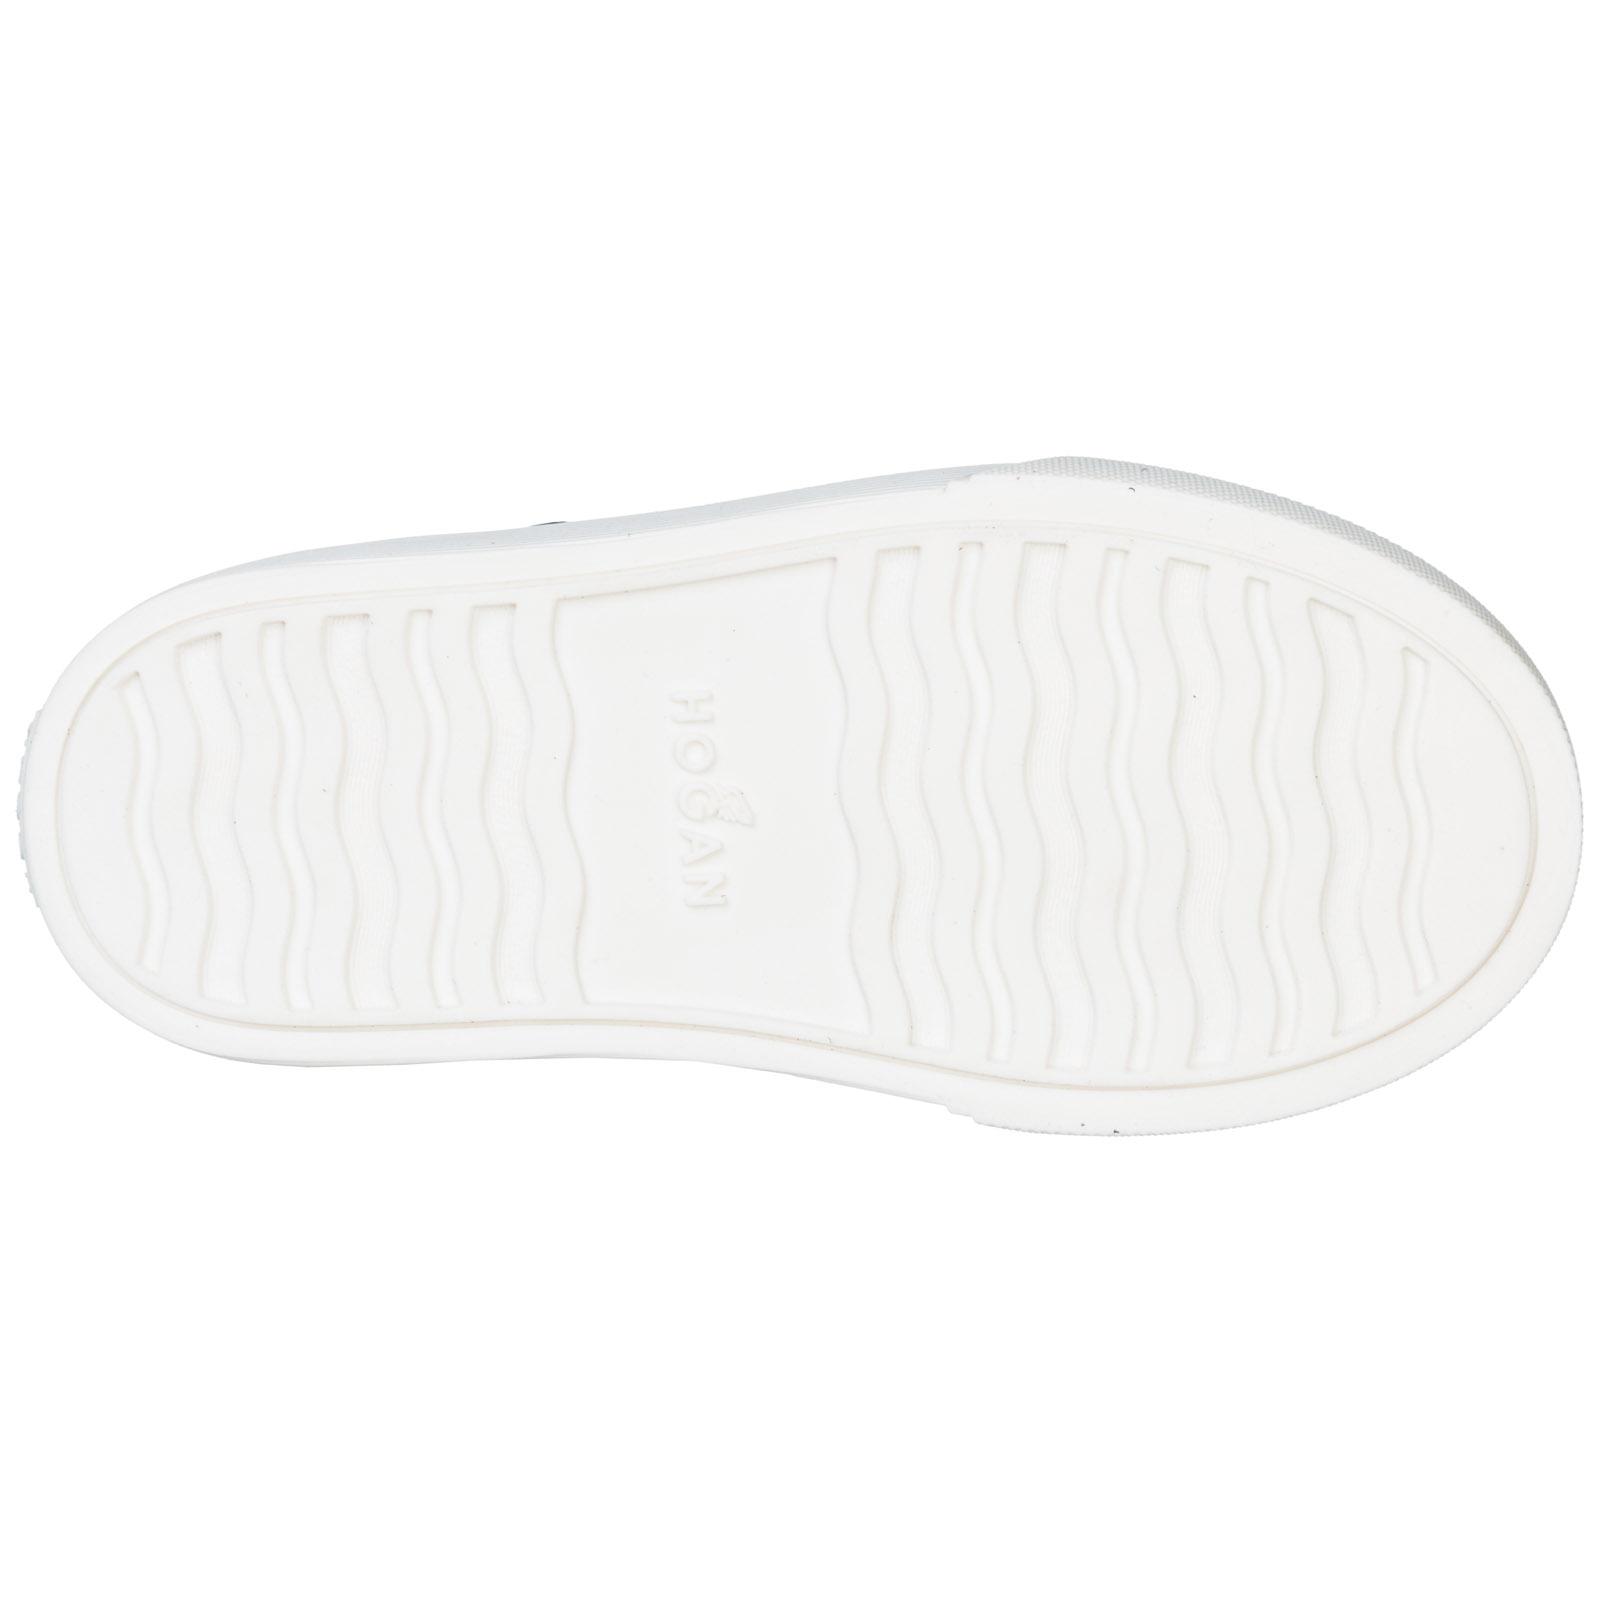 Sneakers Hogan H365 Hxt Ax80g9q274l Blu